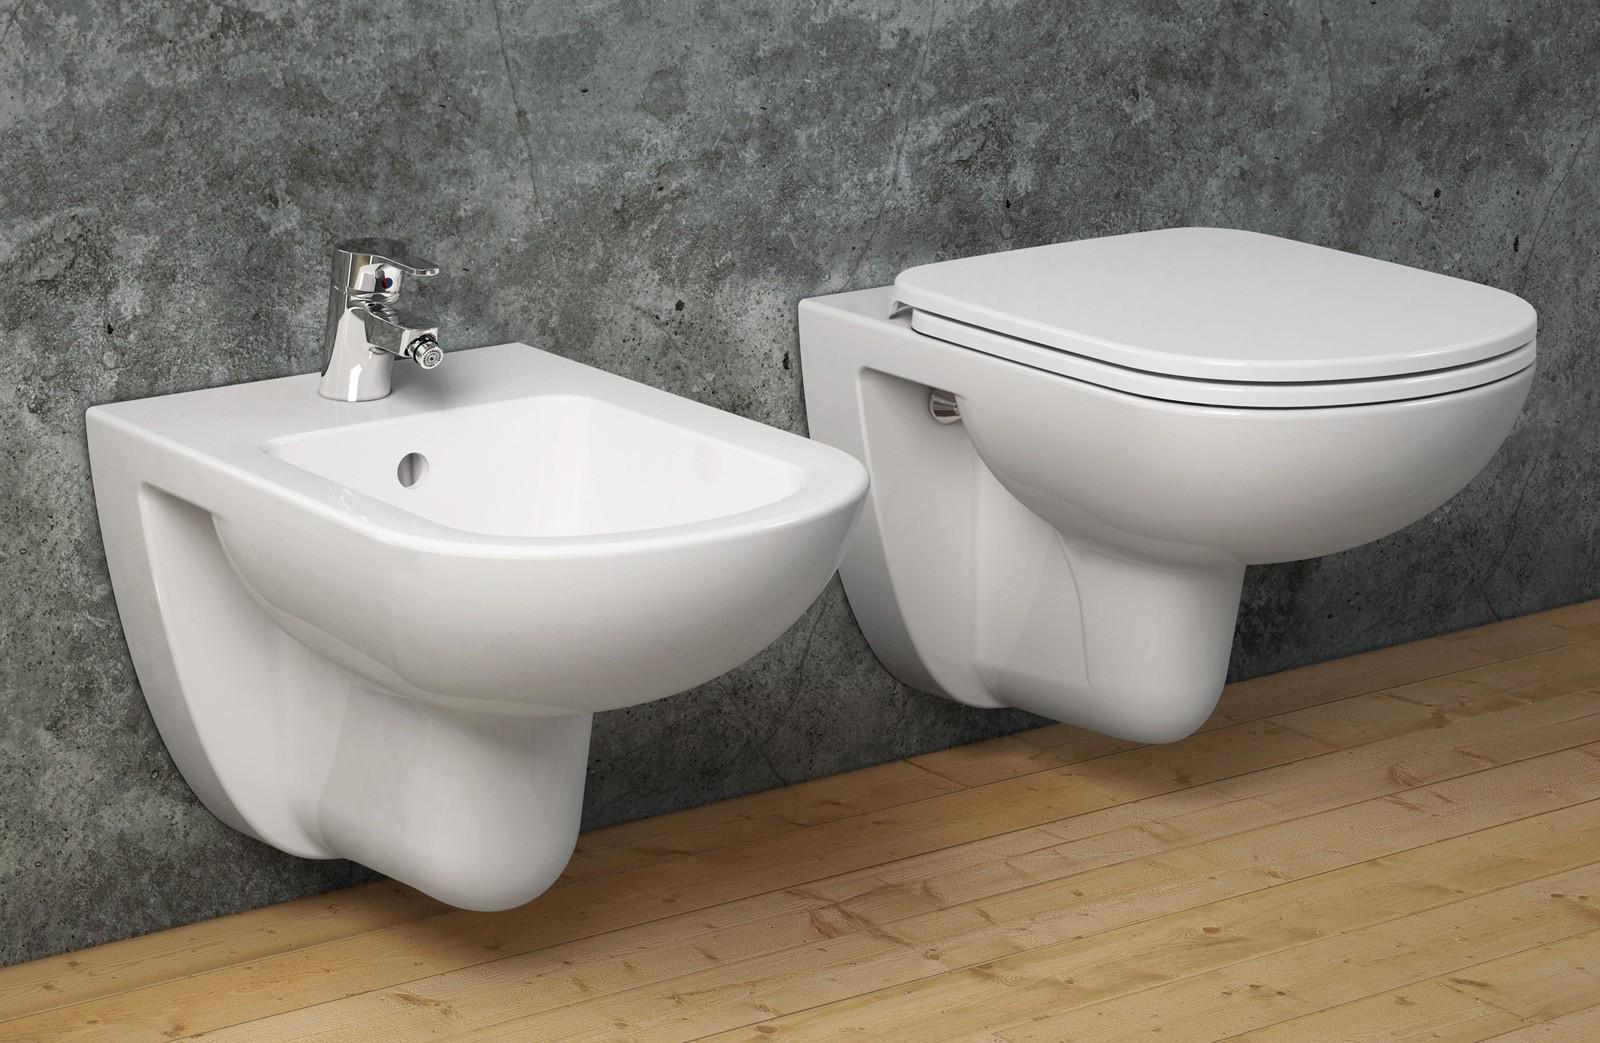 Mobili lavelli sanitari dolomite prezzi - Sanitari per bagno prezzi ...